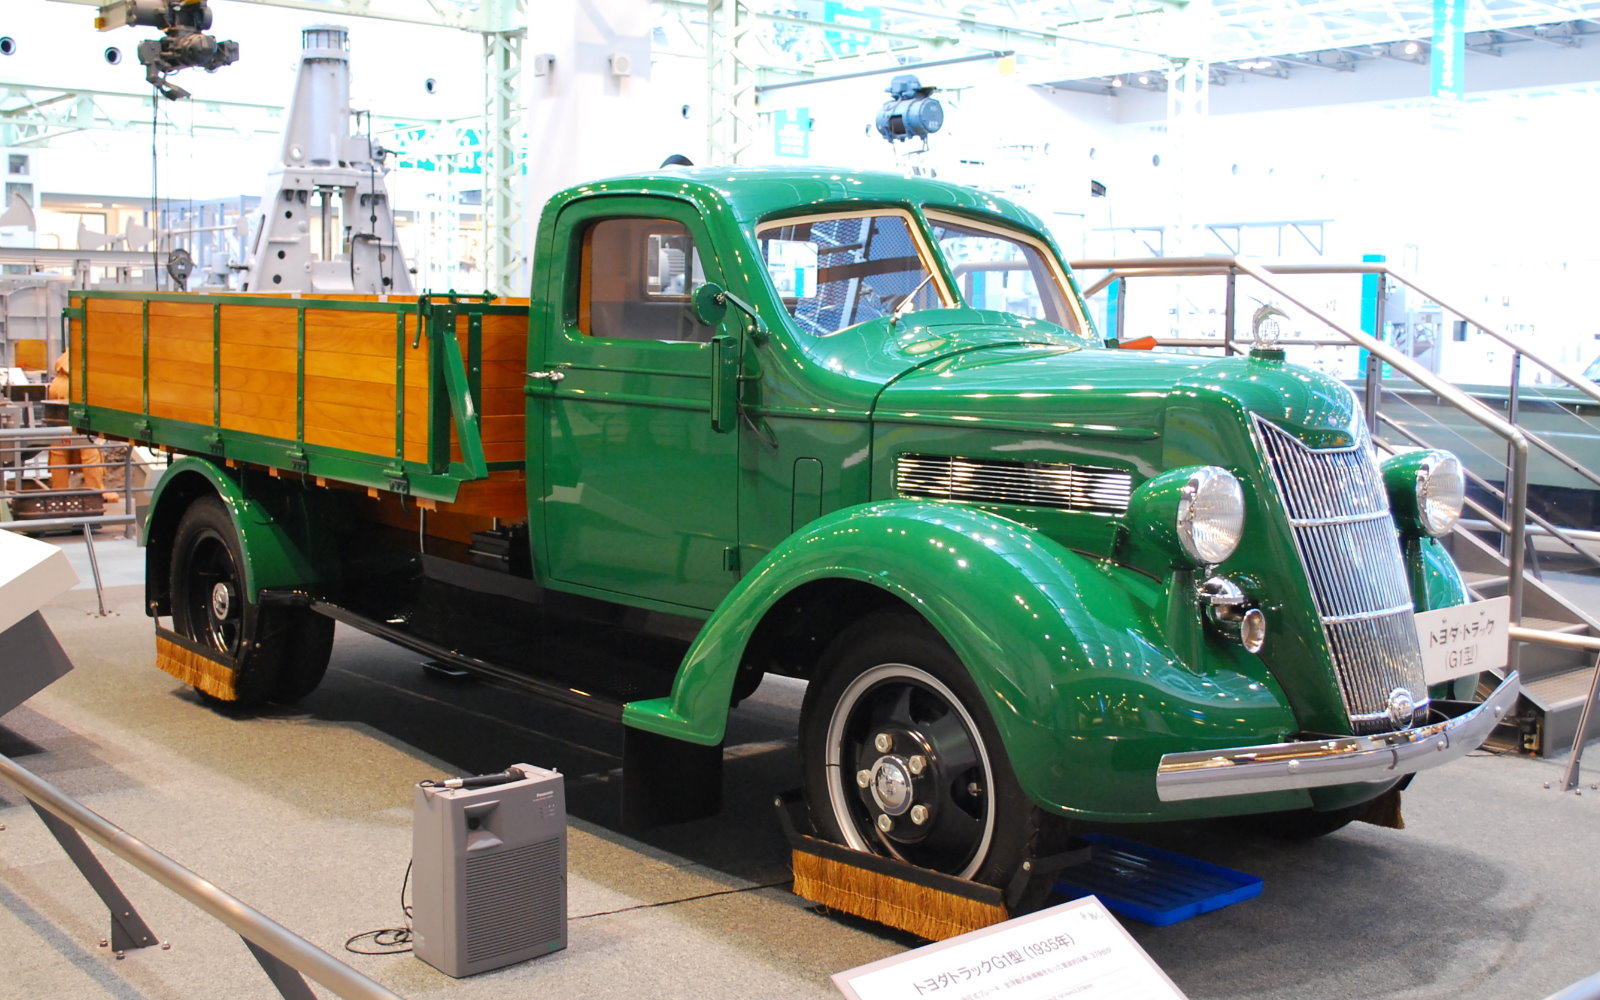 1940 Chevy Truck >> File:1935 Toyoda Model G1 Truck 01.jpg - Wikimedia Commons